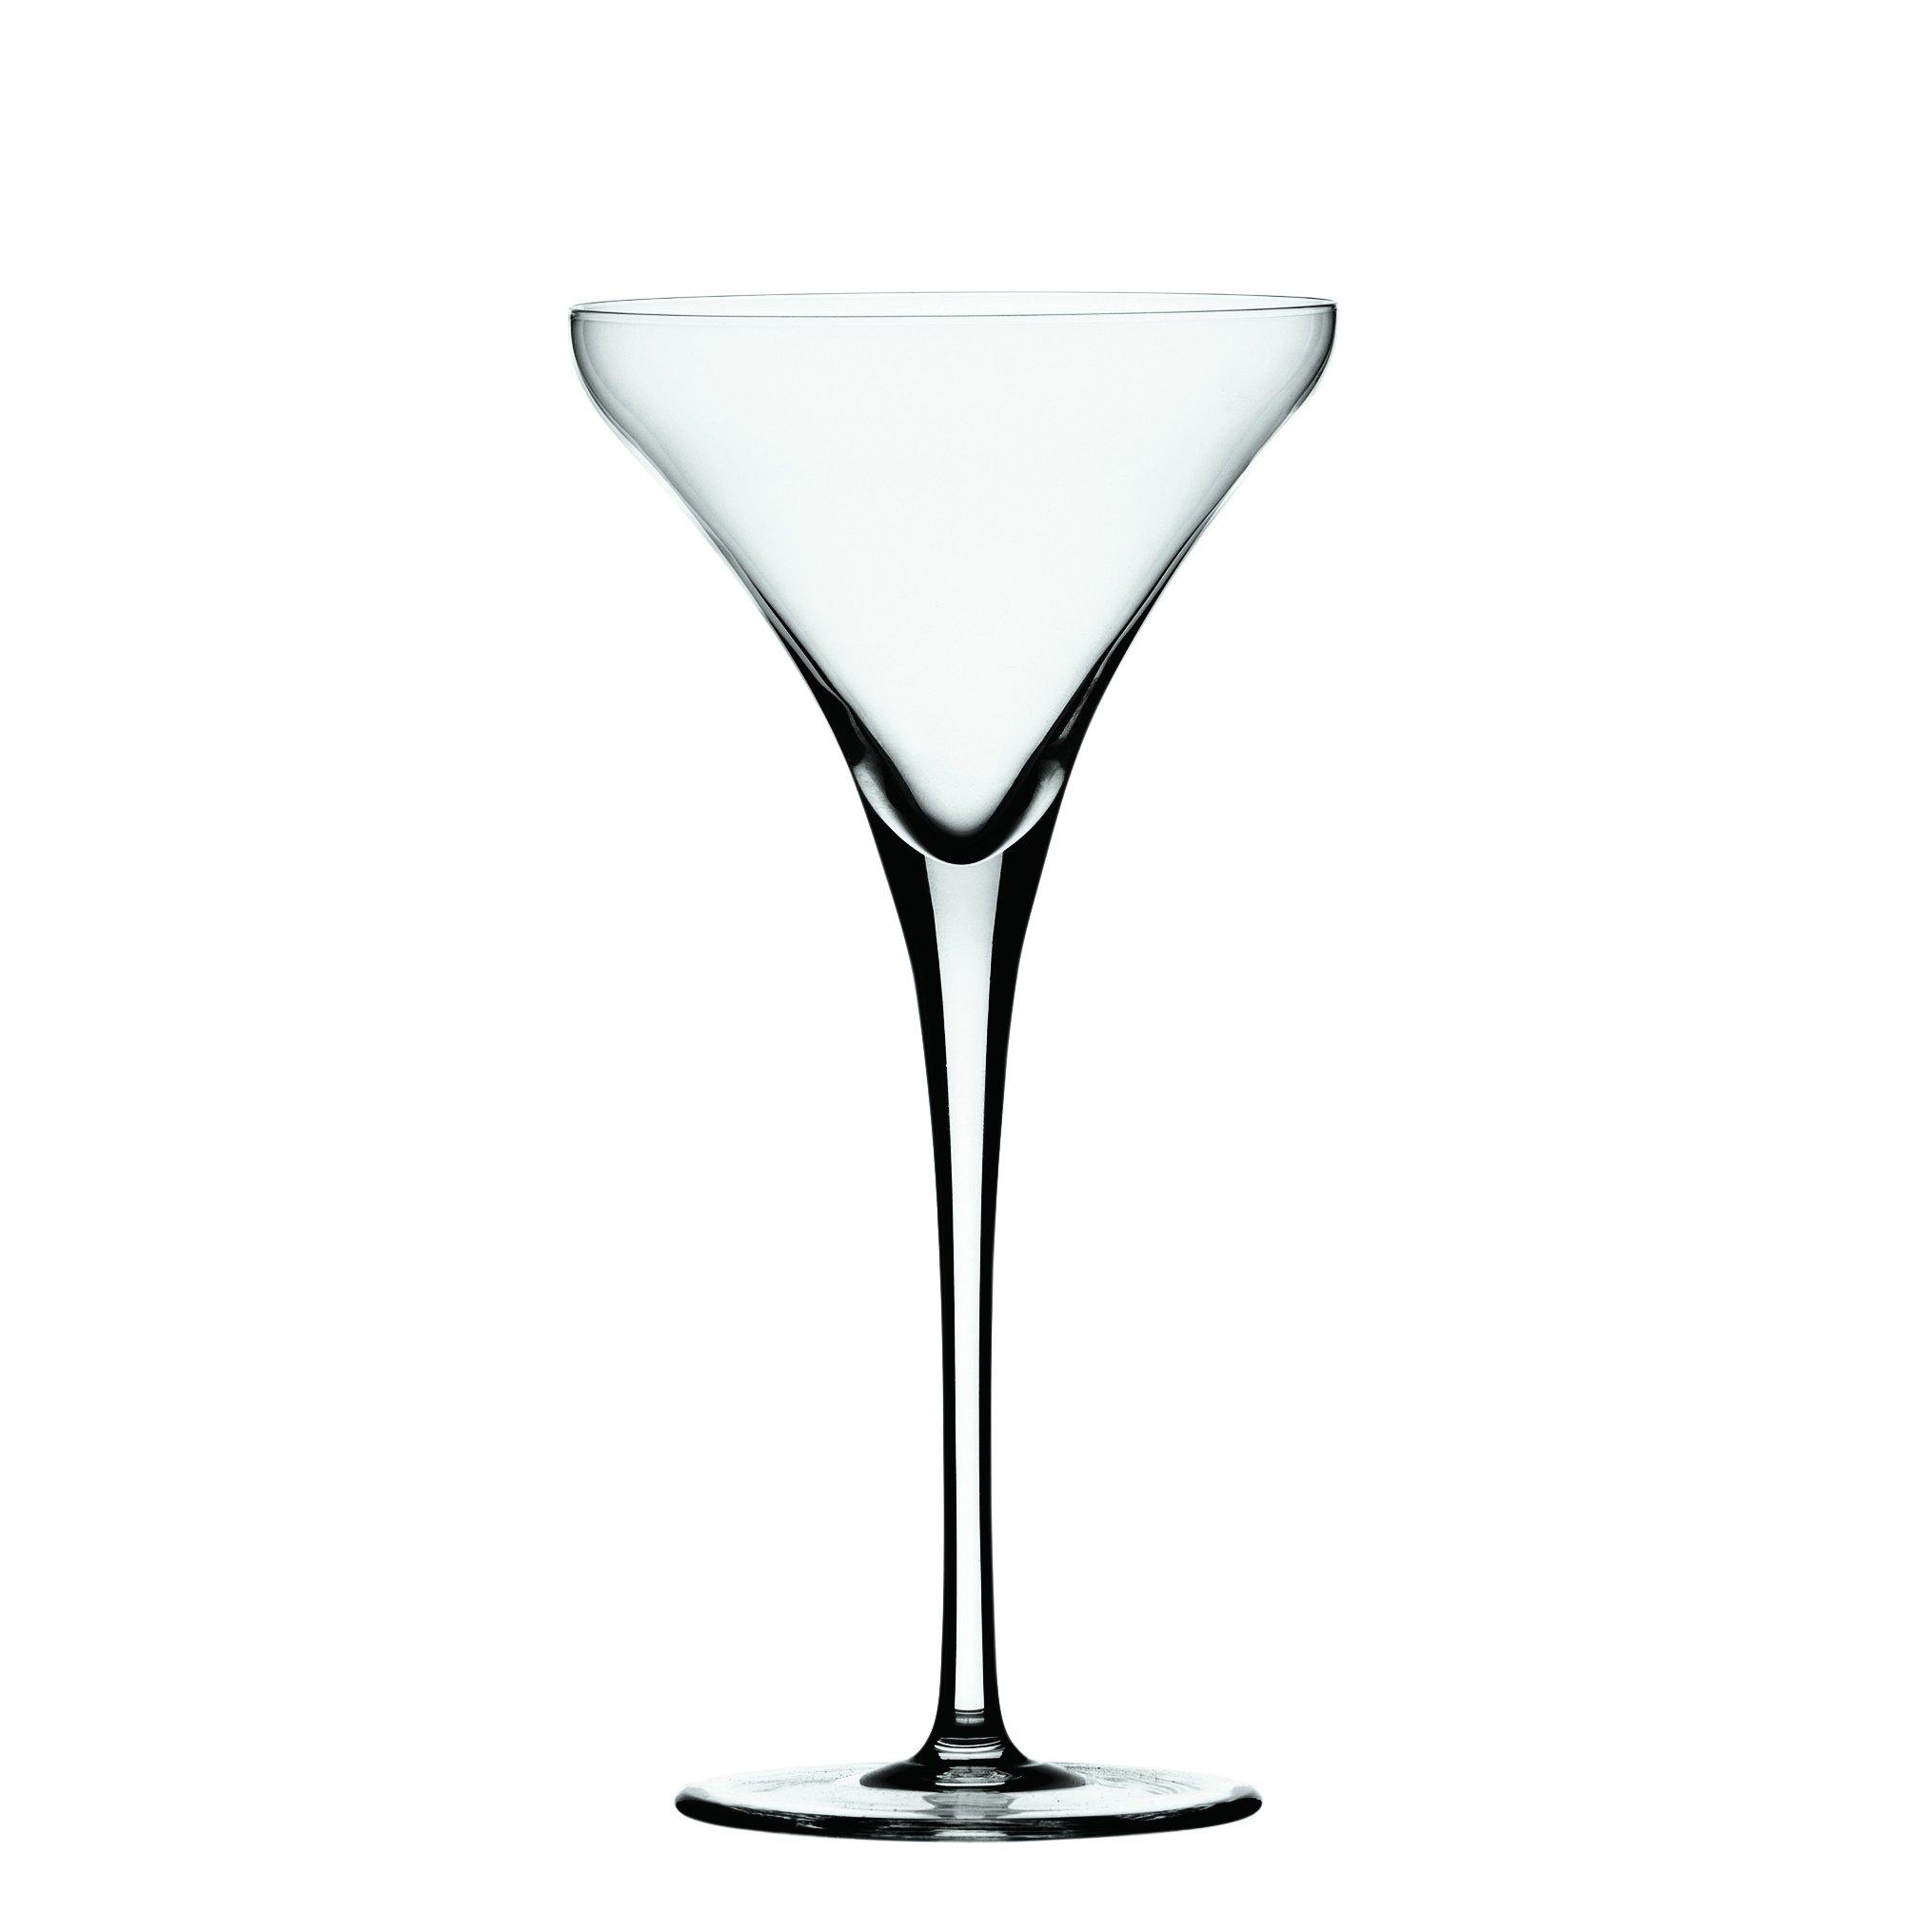 Spiegelau Willsberger Martini Glass (Set of 4), 8.75 oz, Clear